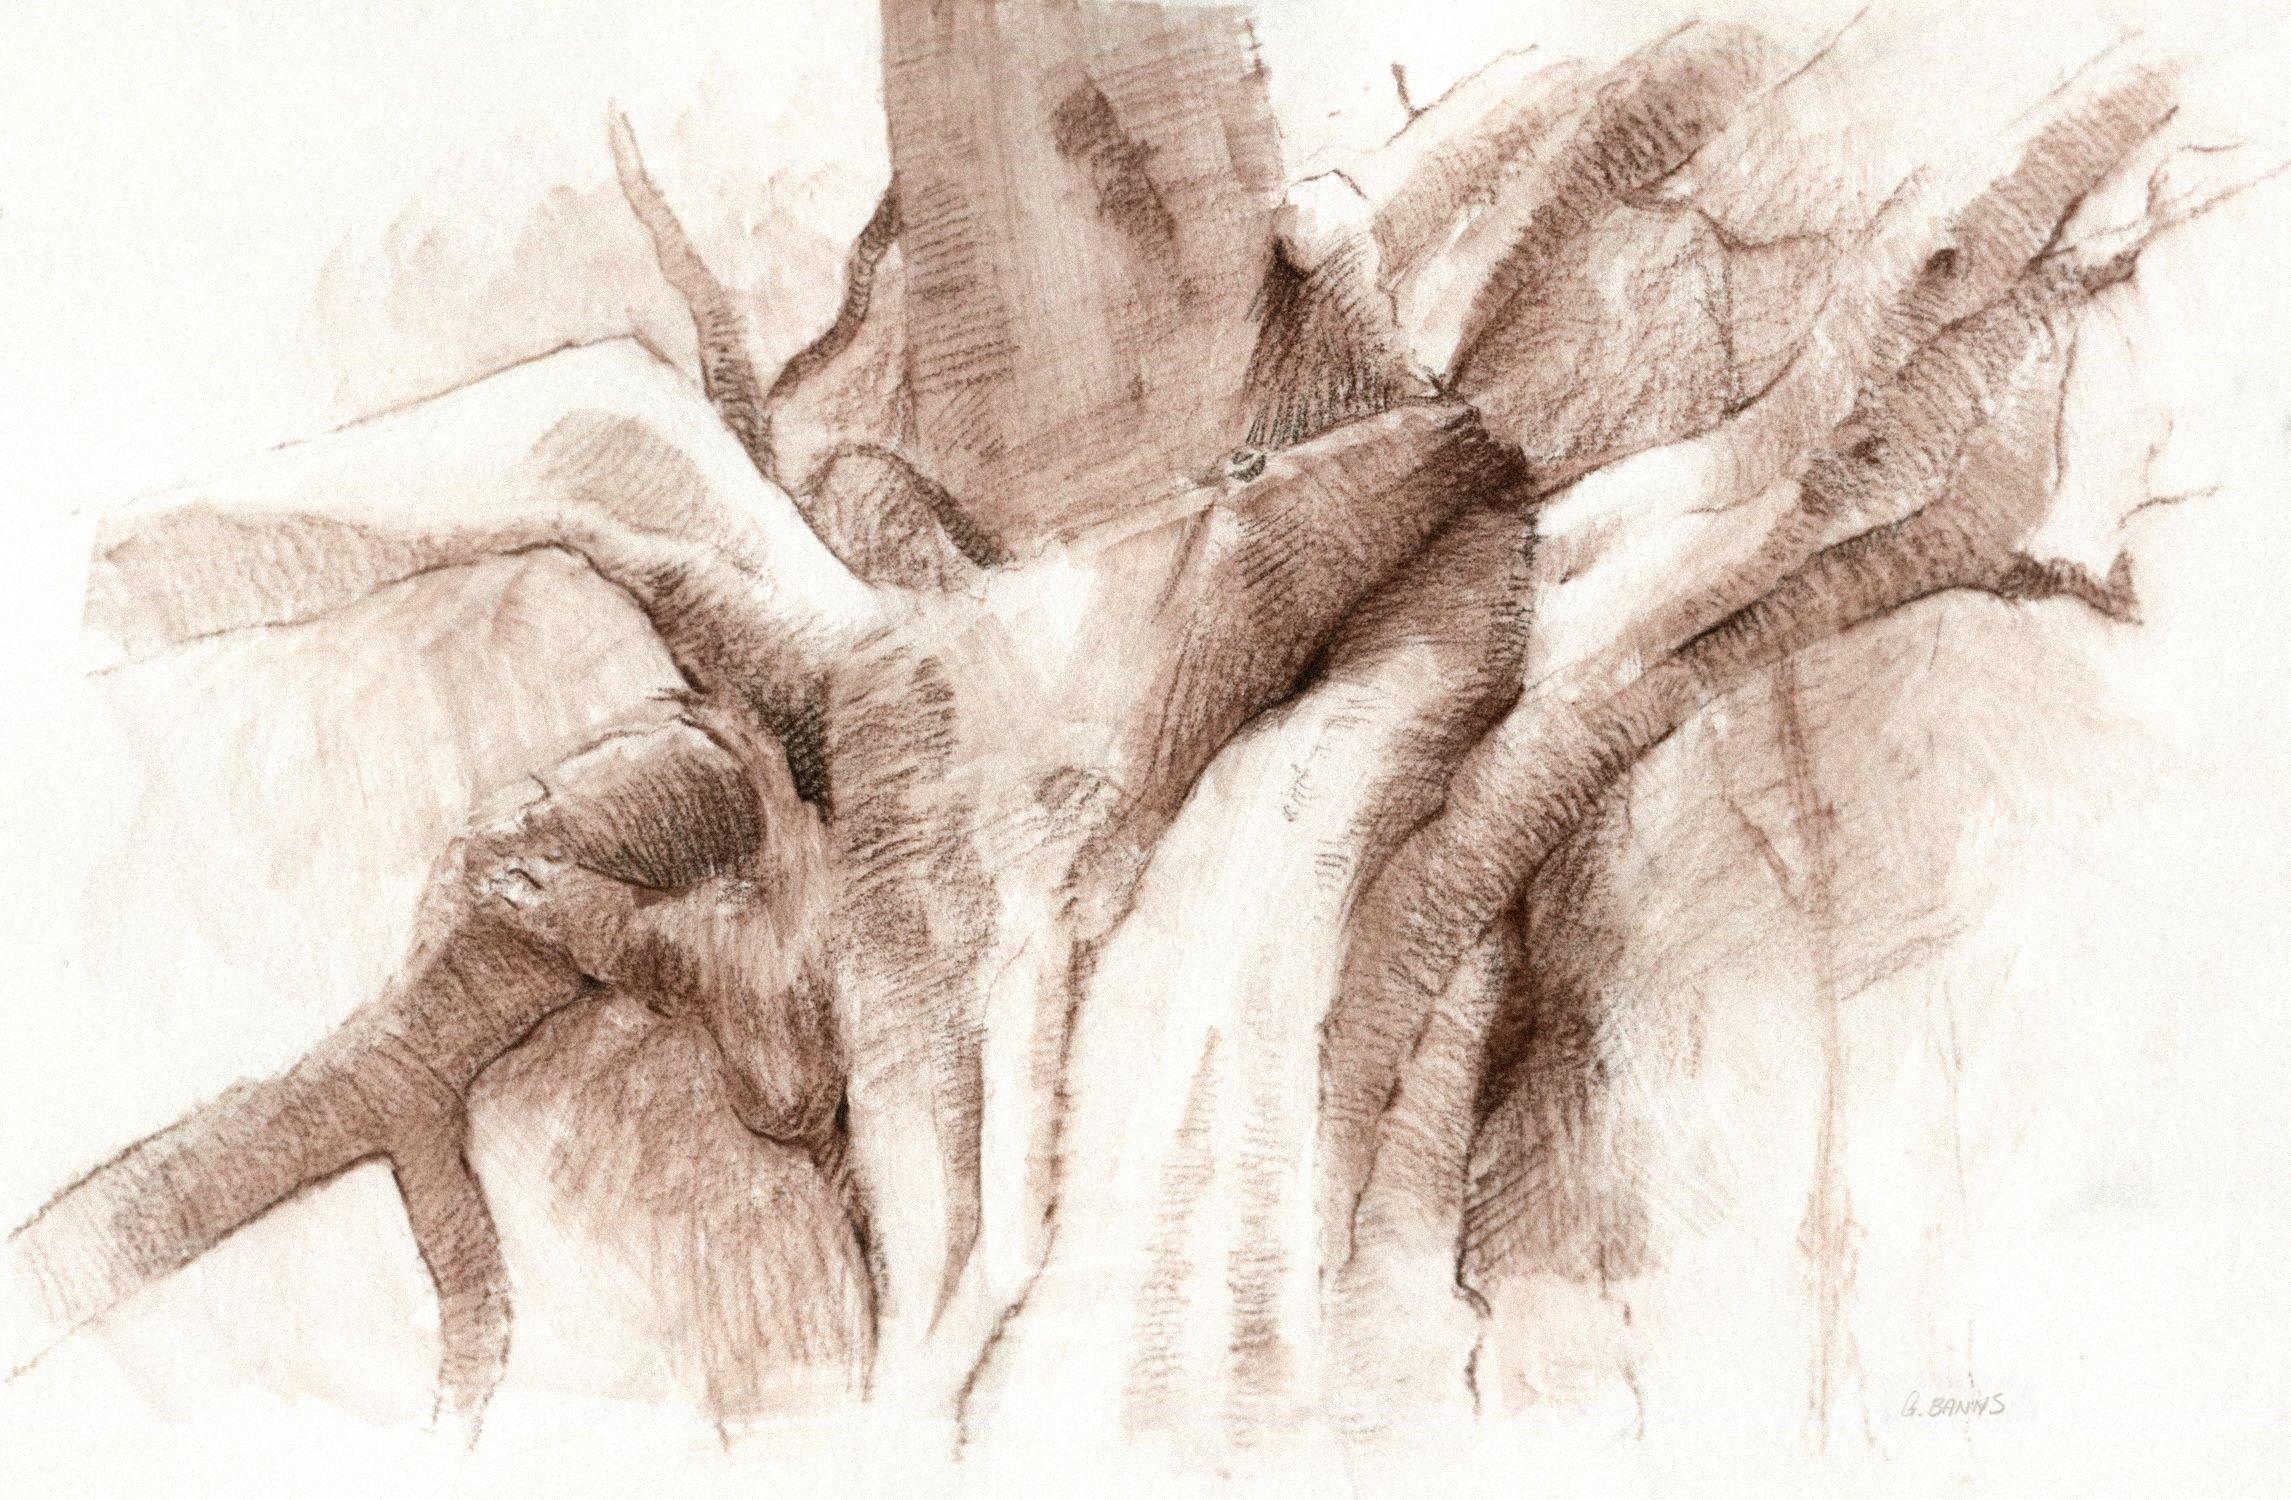 The Old Oak Tree by